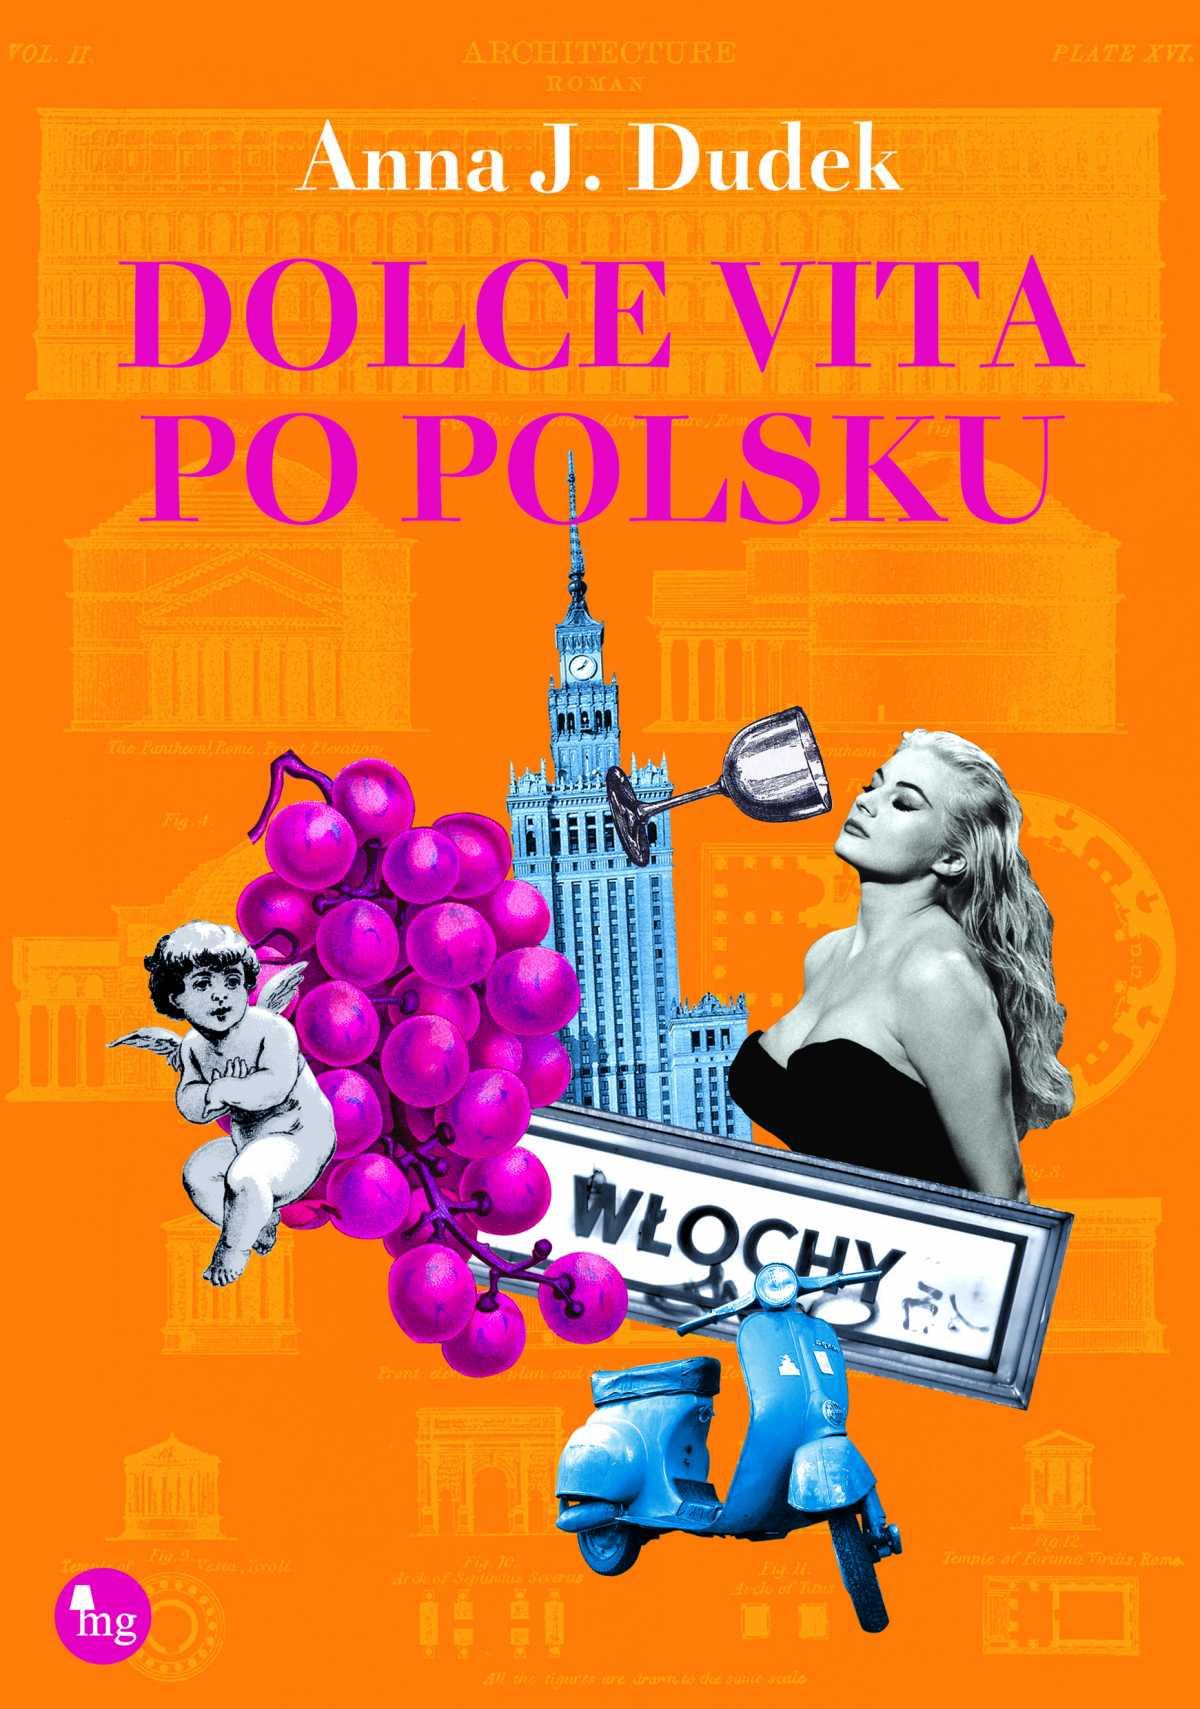 Dolce vita po polsku - Ebook (Książka EPUB) do pobrania w formacie EPUB